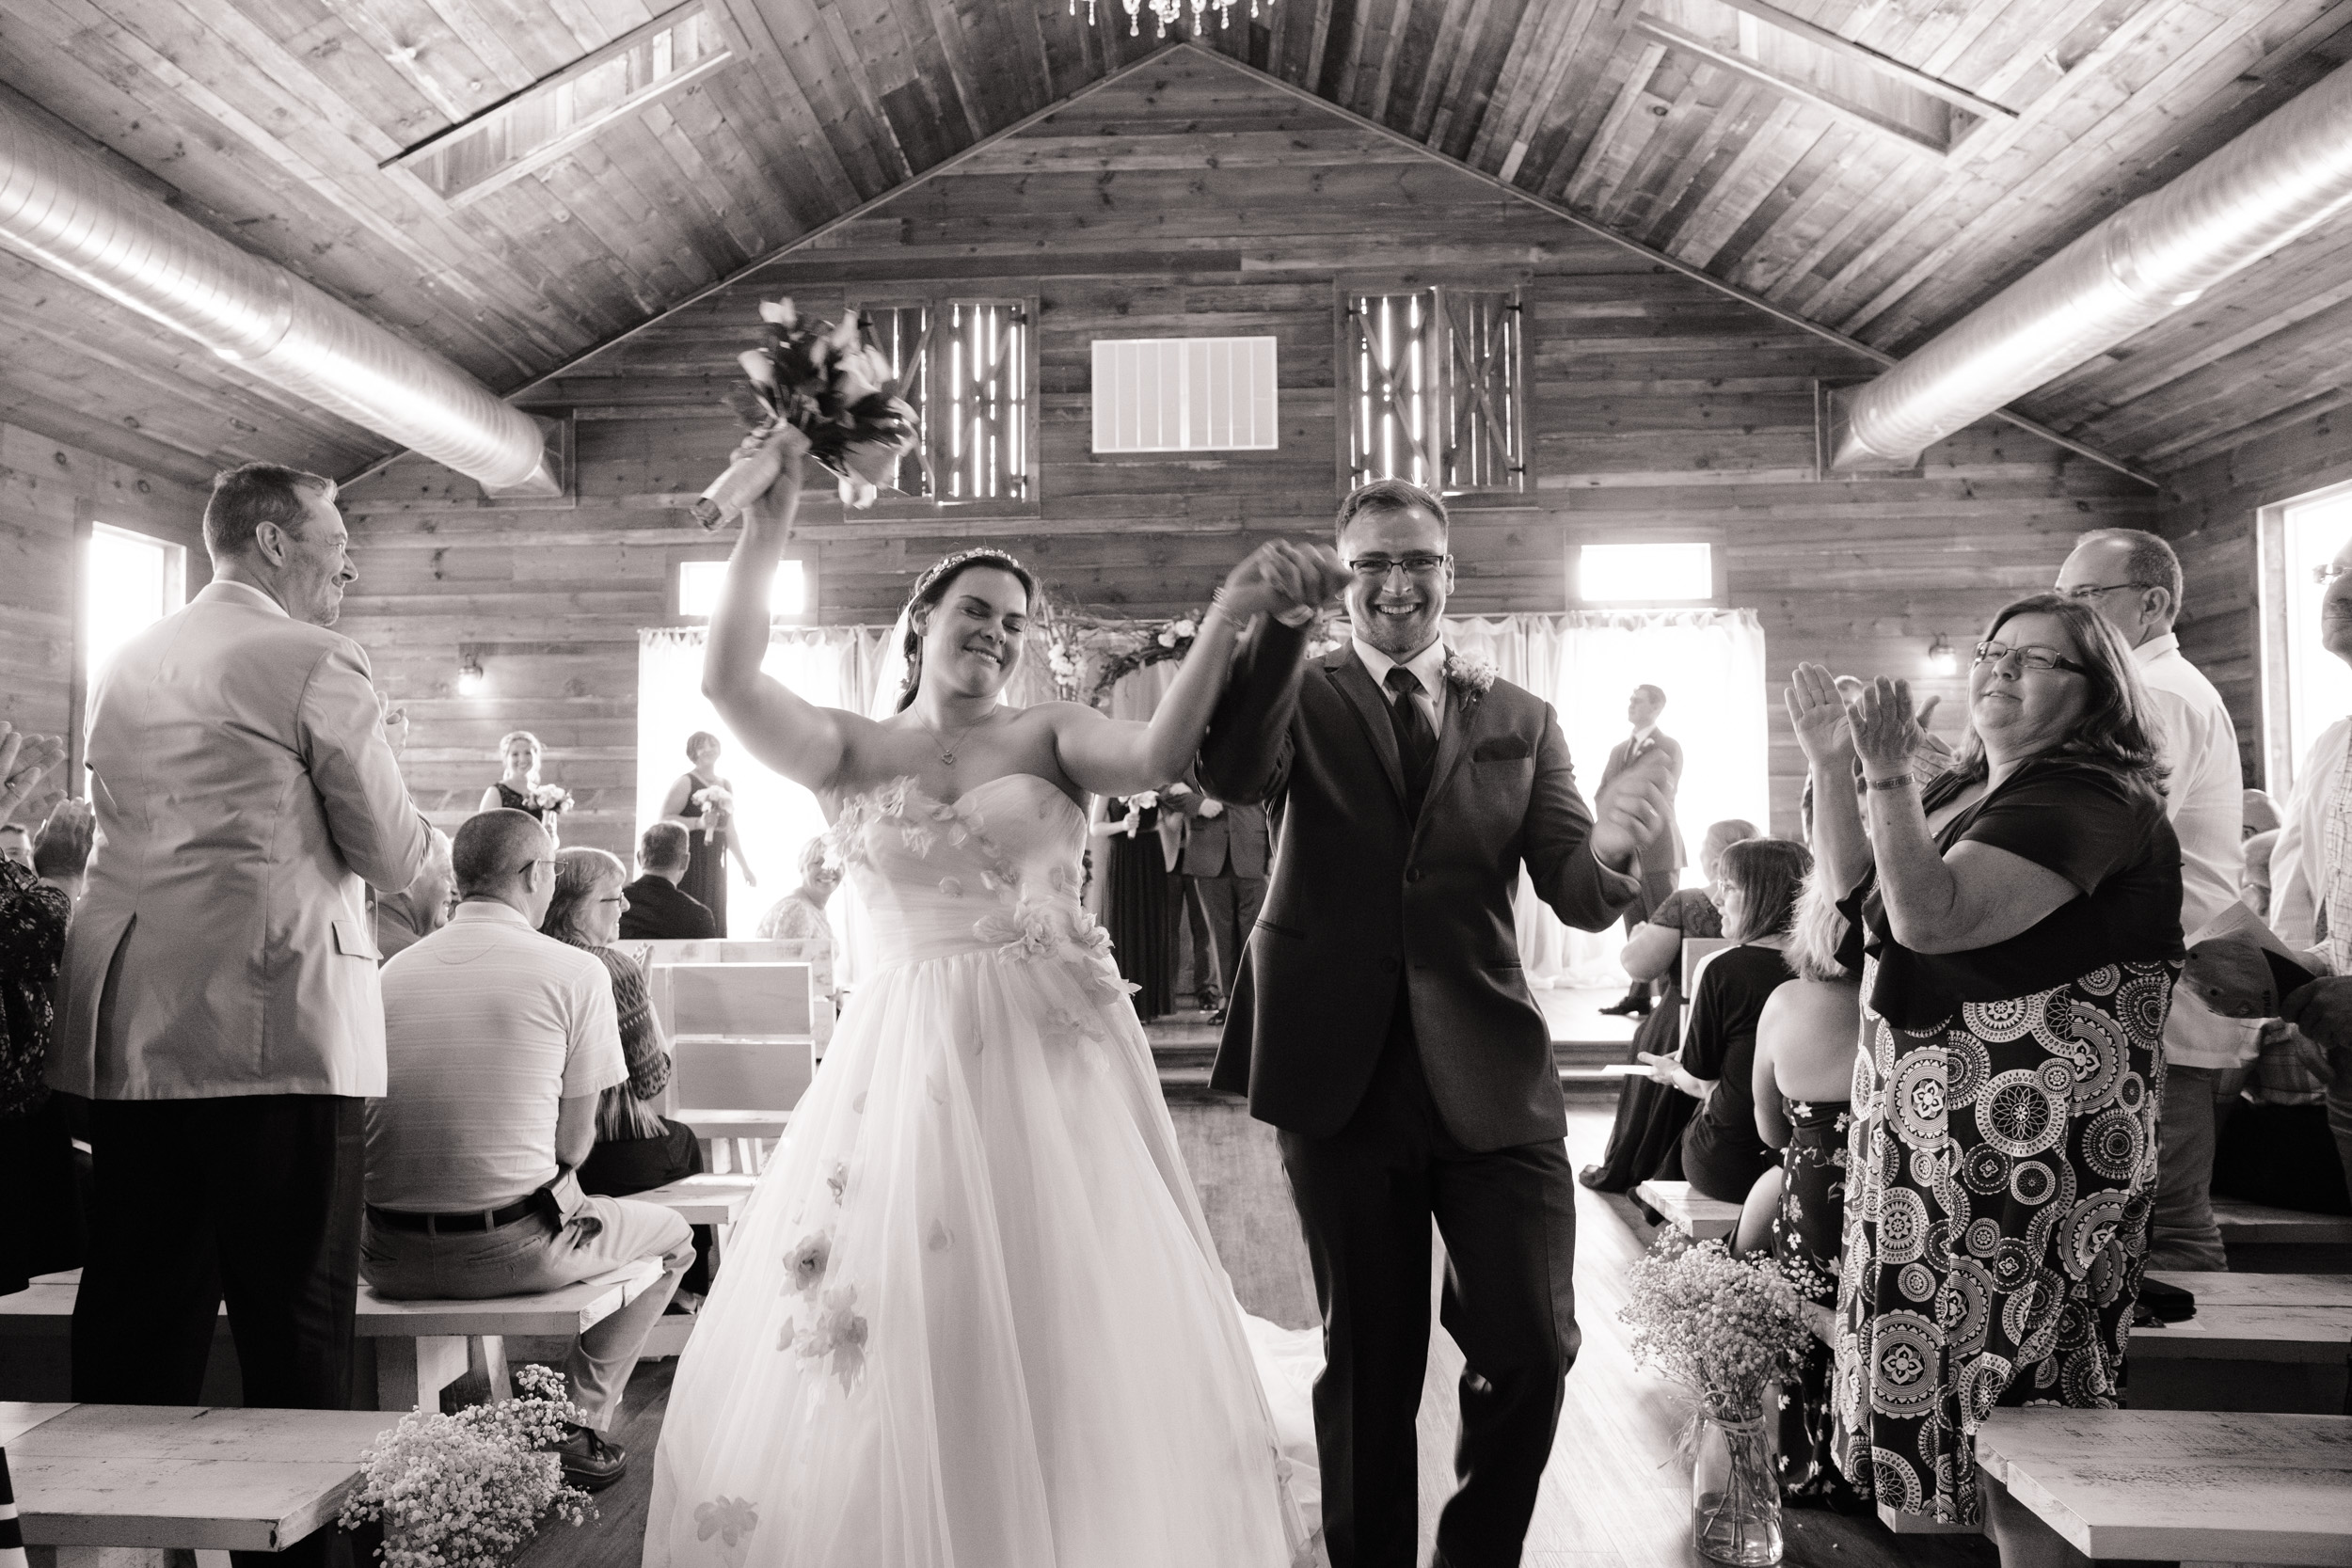 19-06-22-Ryan-Katie-The-Fields-Reserve-Wedding-36.jpg